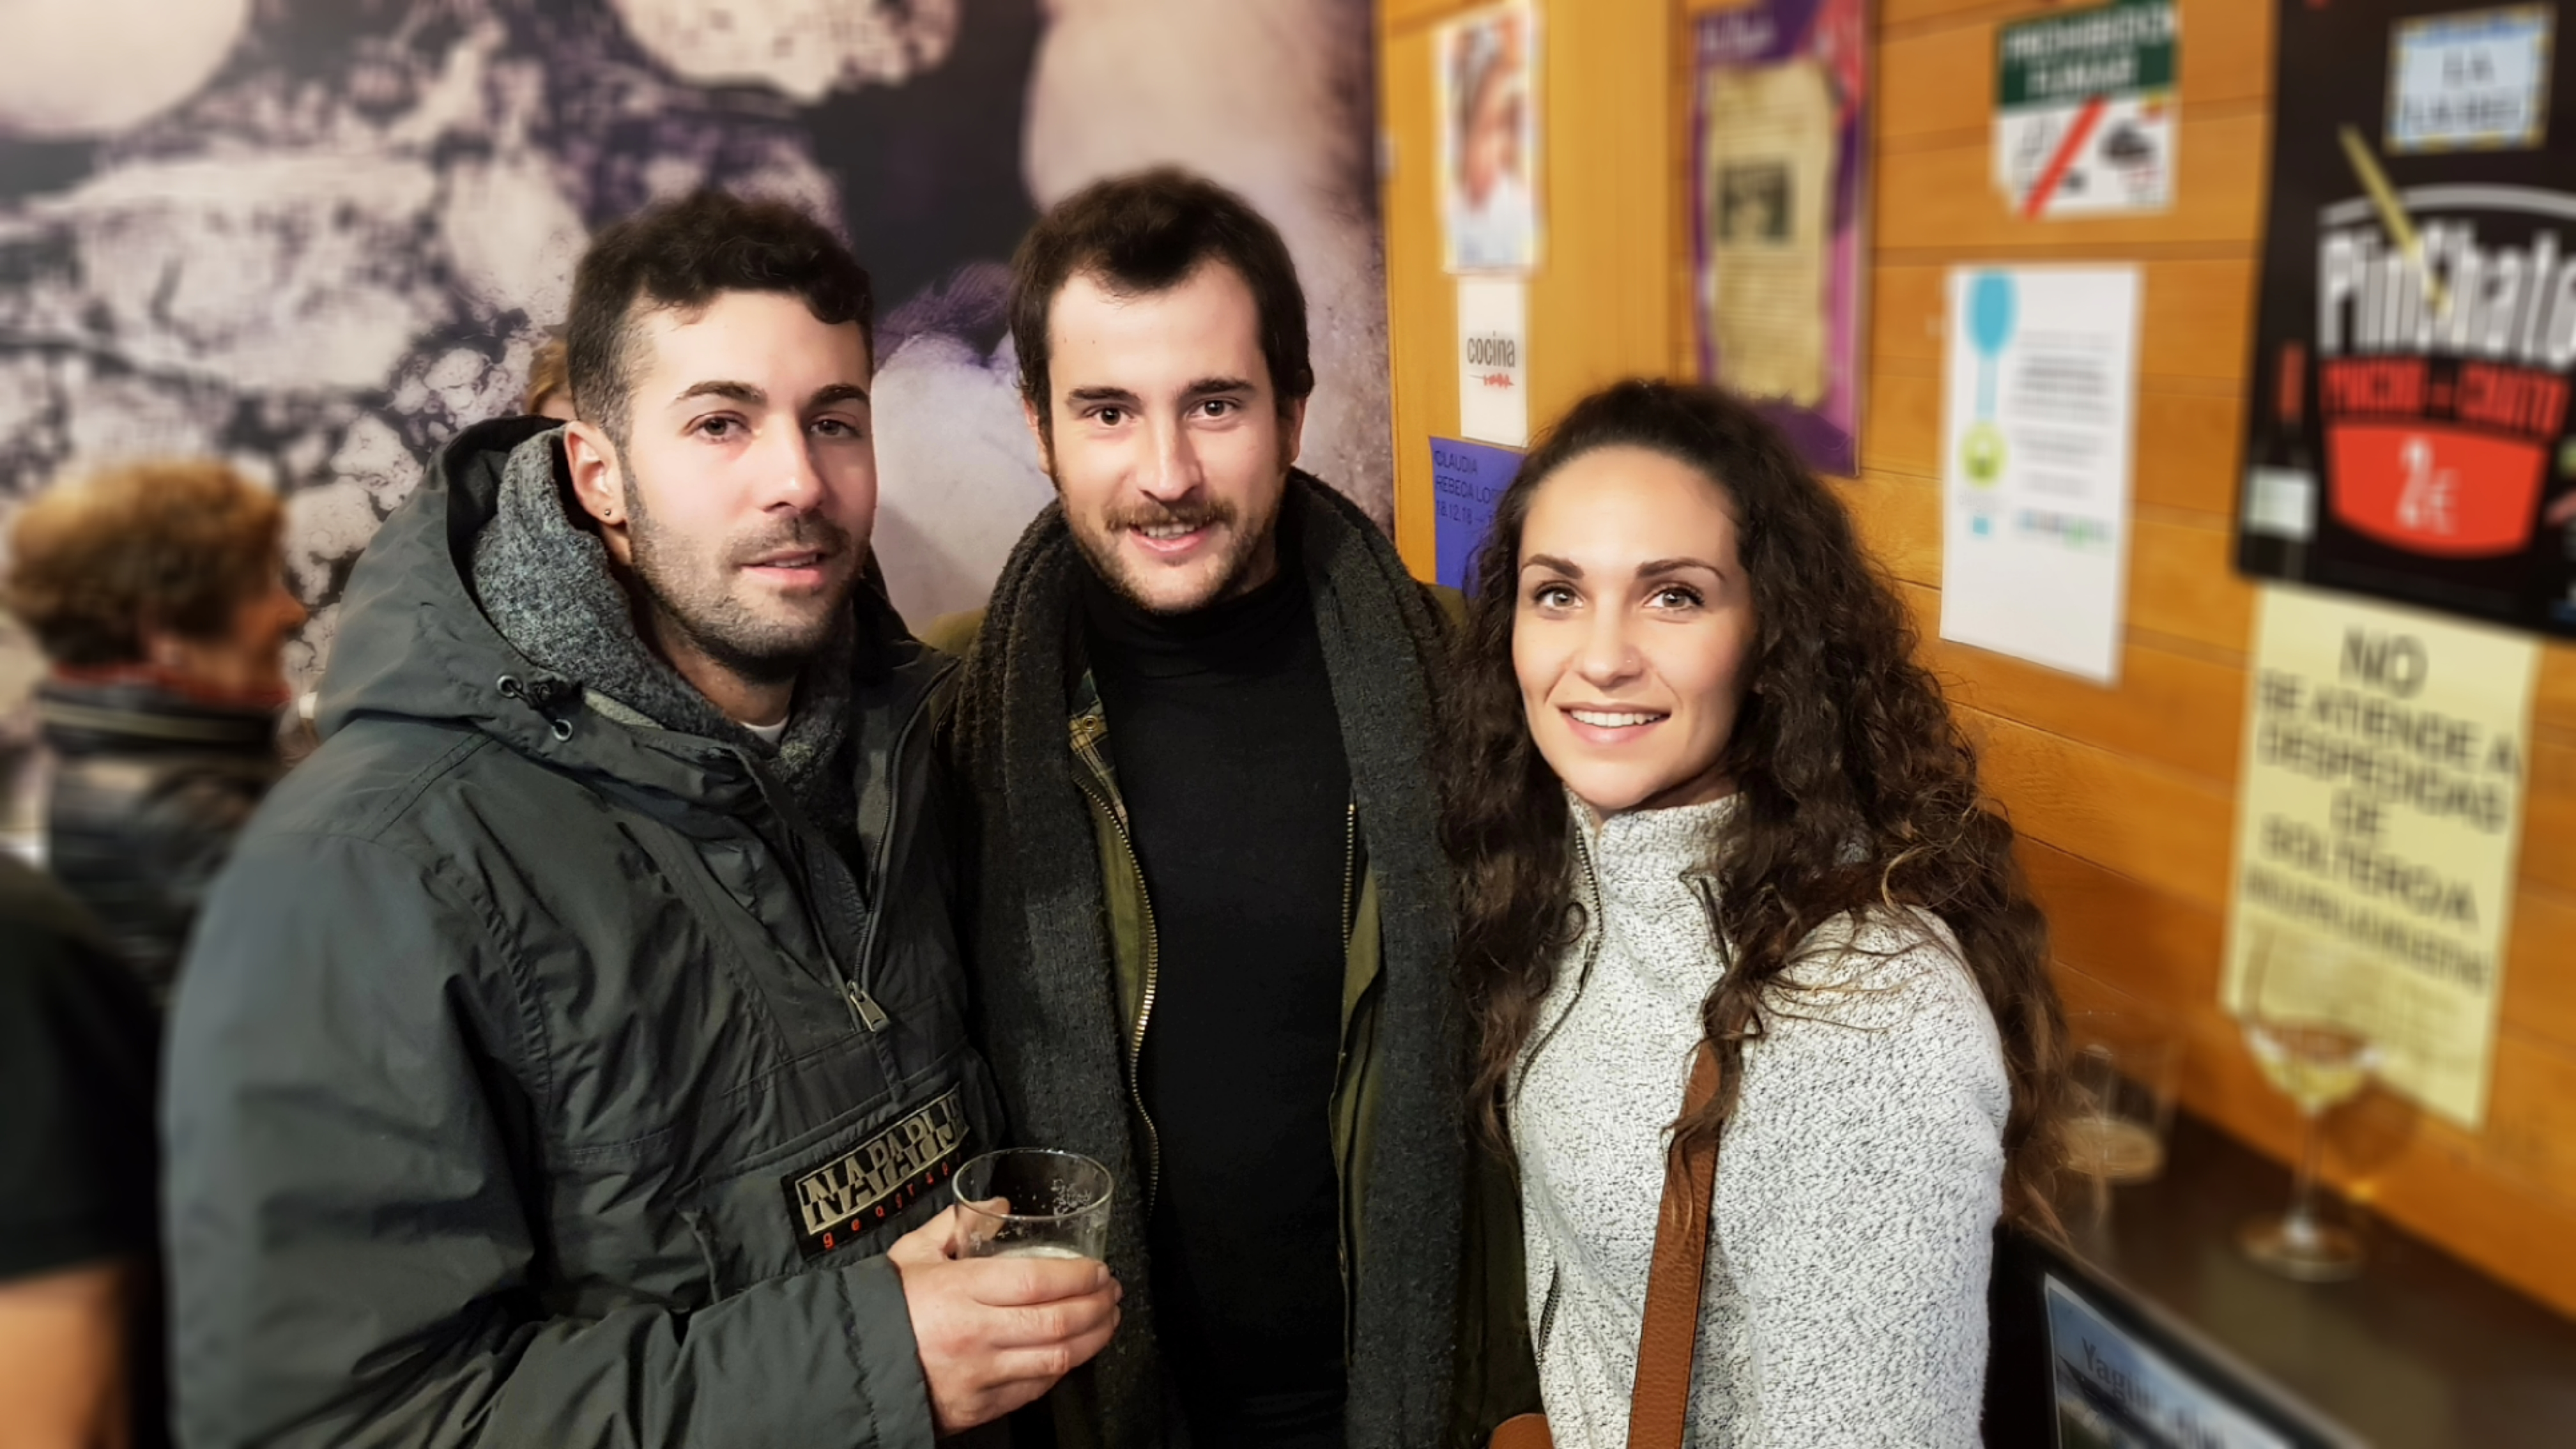 Bar Lorenzo con mi amigo Bruno, él nos hizo esta magnífica ruta por La Rioja